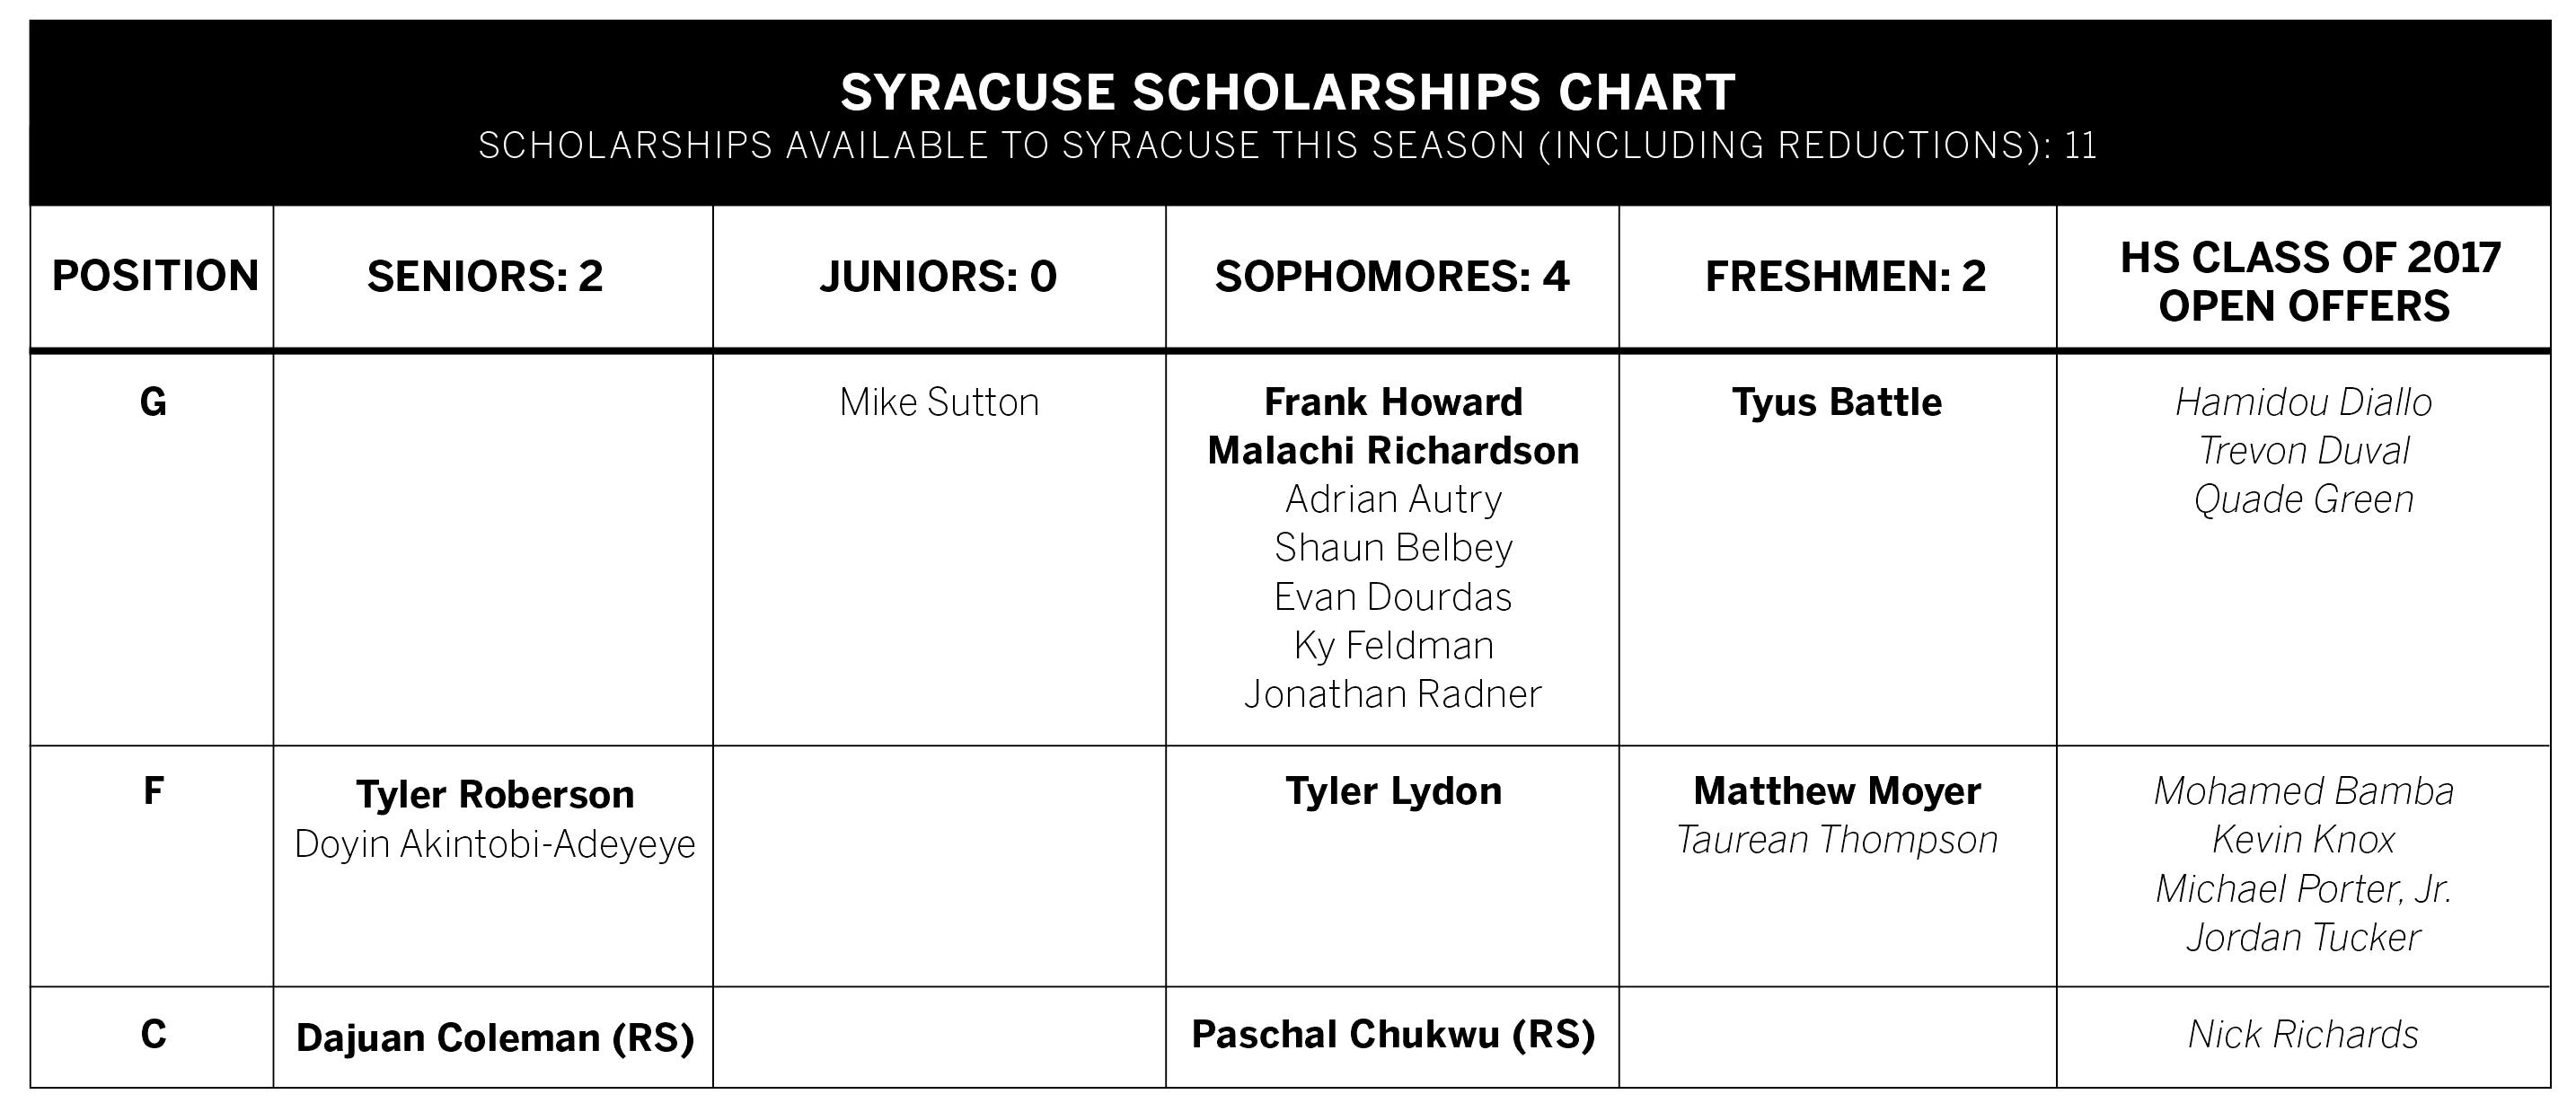 Scholarships 6